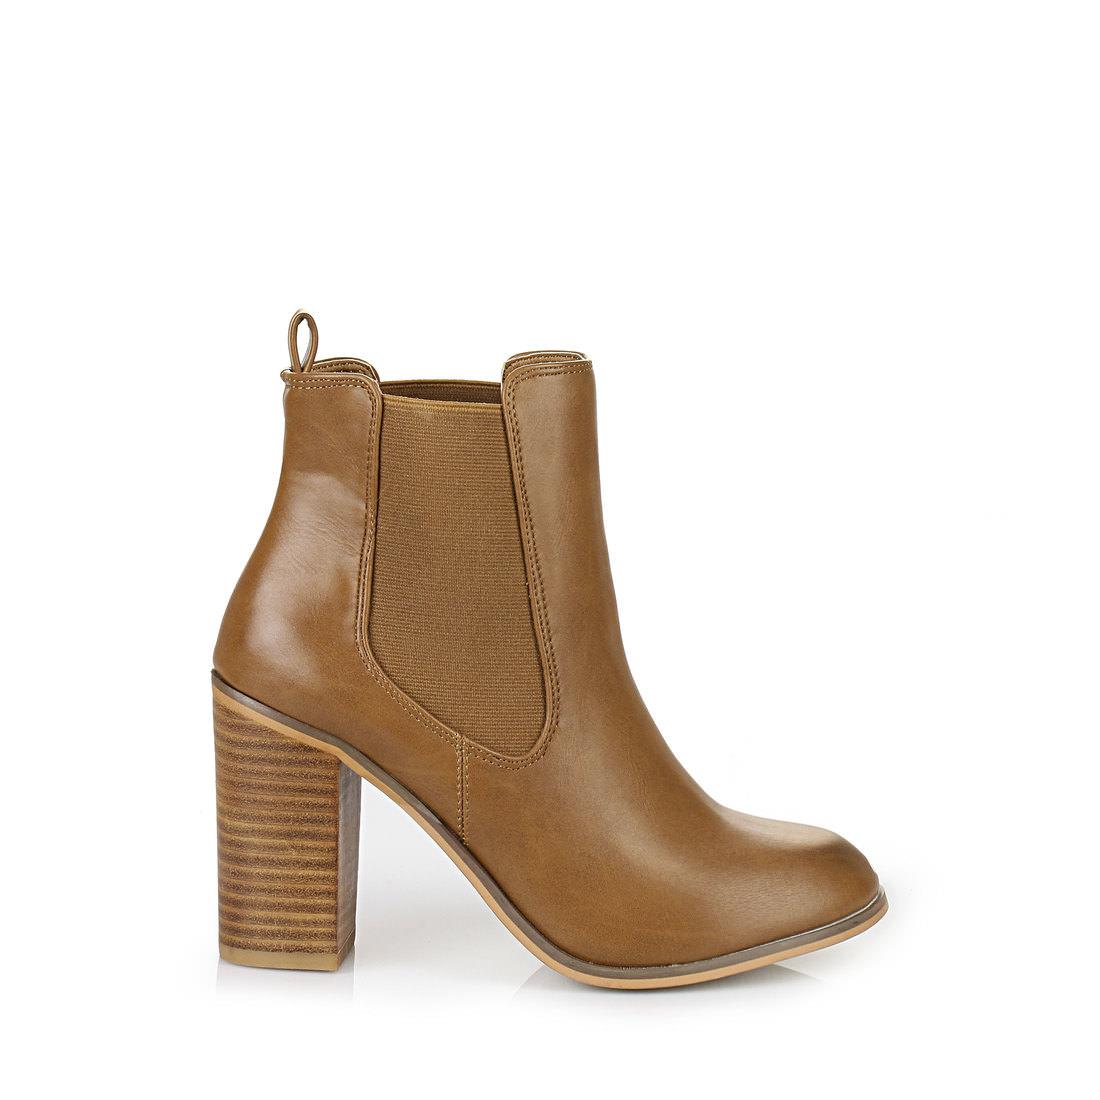 buffalo ankle boots in cognac buy online in buffalo online shop buffalo. Black Bedroom Furniture Sets. Home Design Ideas